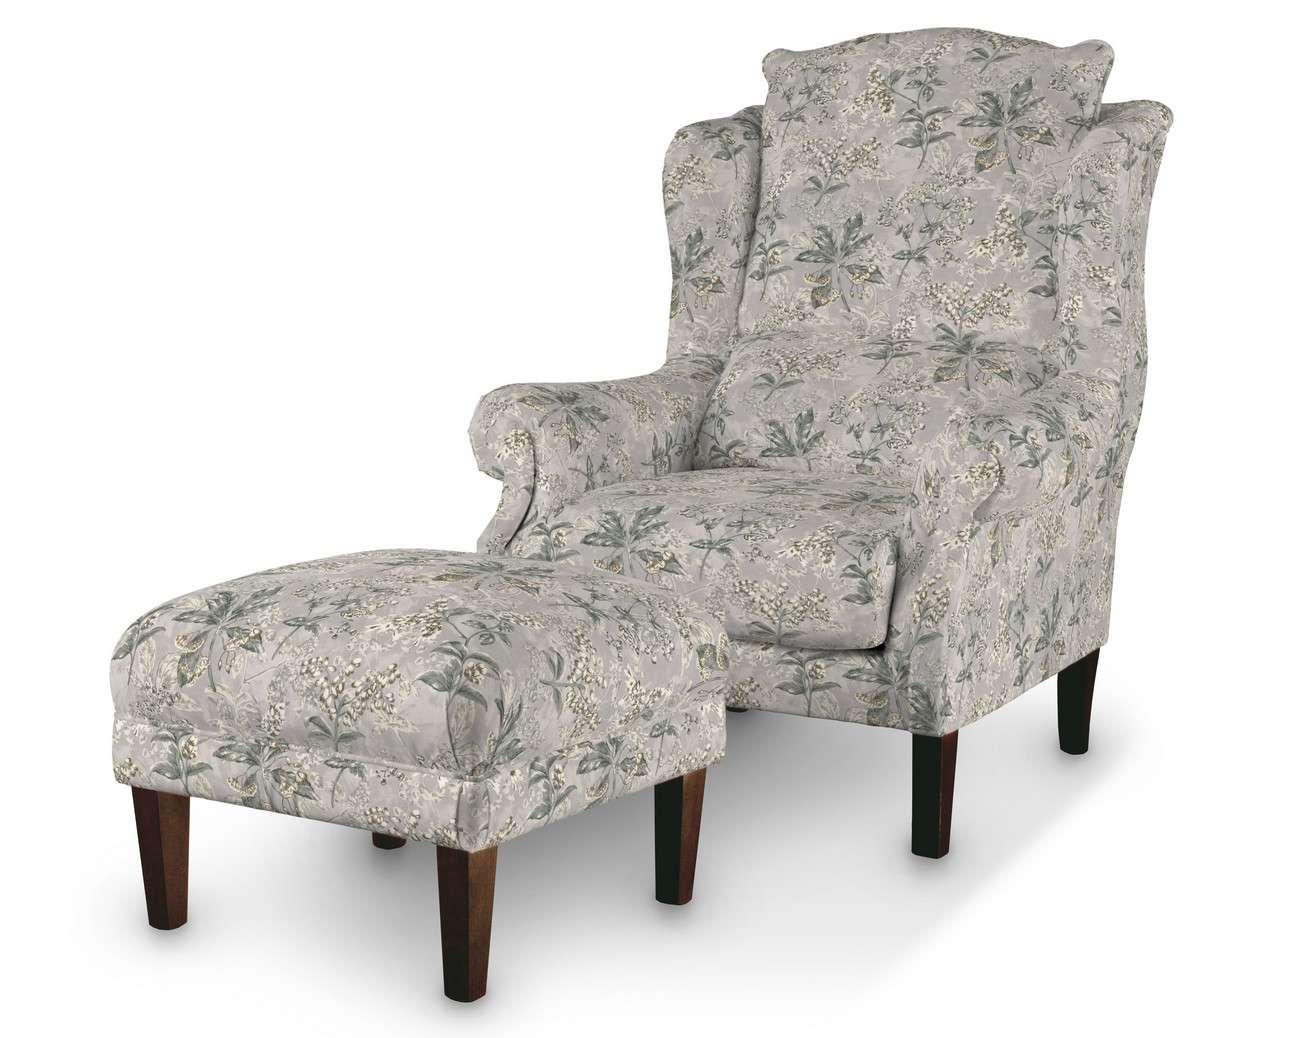 Podnóżek do fotela w kolekcji Londres, tkanina: 143-37